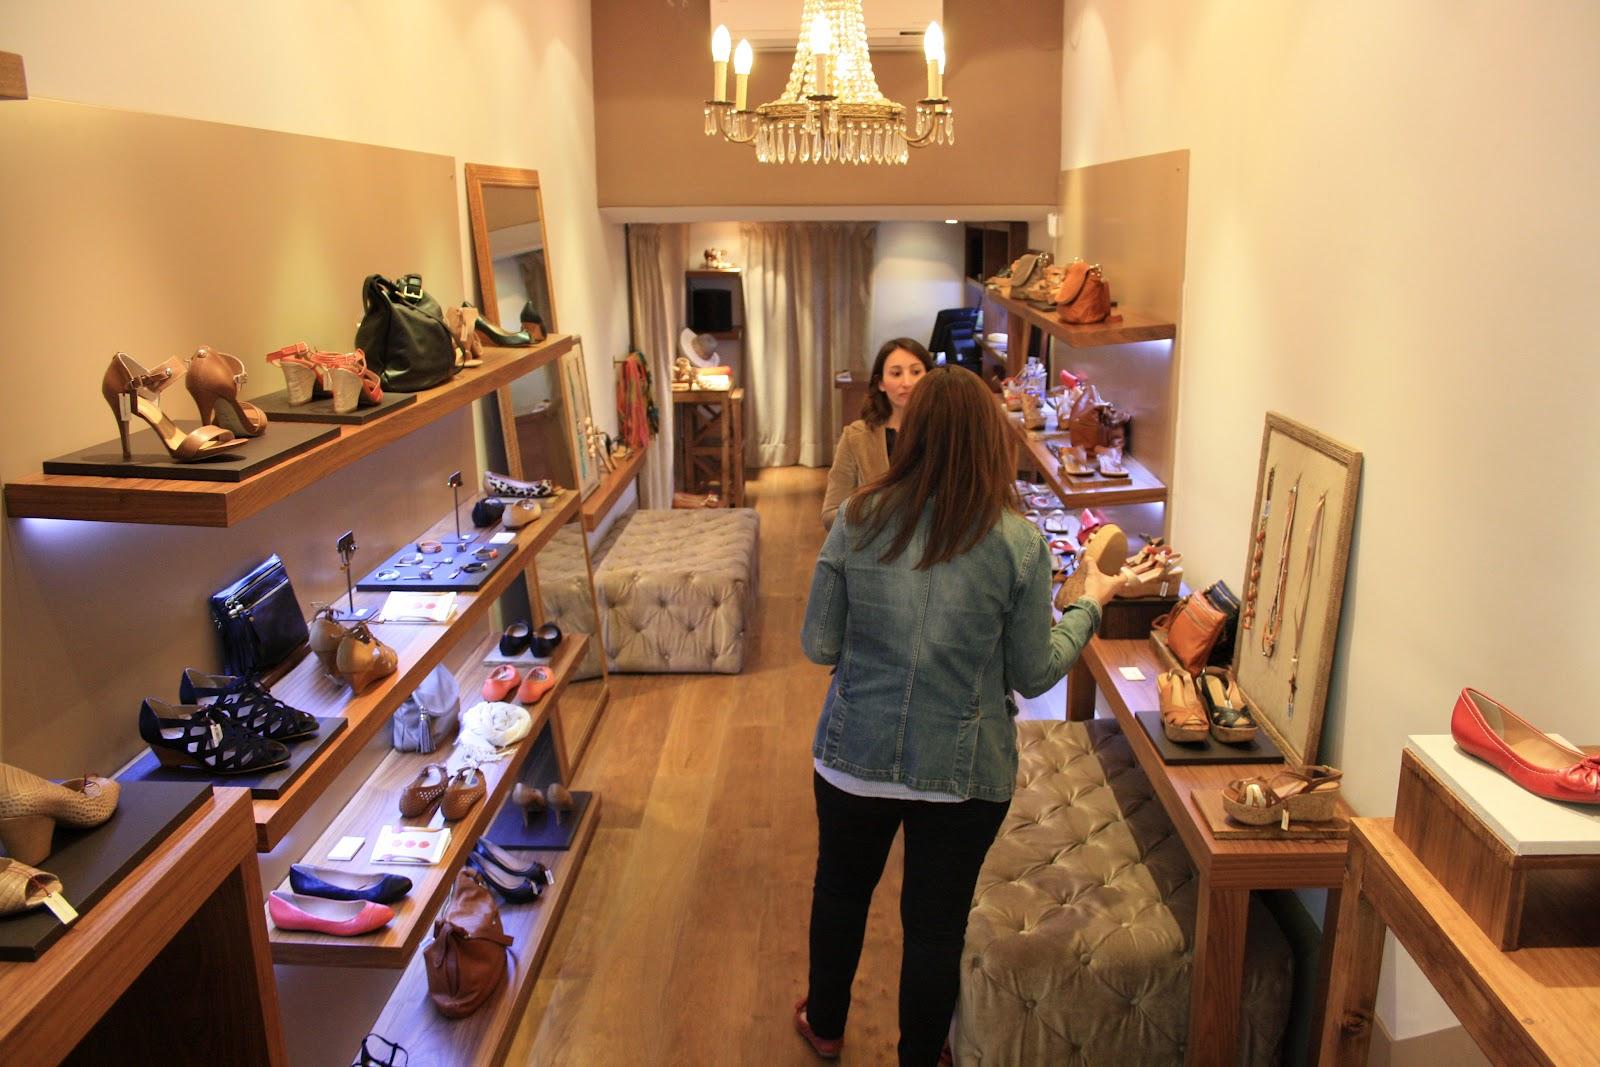 Addict smile lifestyle y moda en barcelona m s que - Casas zapateria barcelona ...